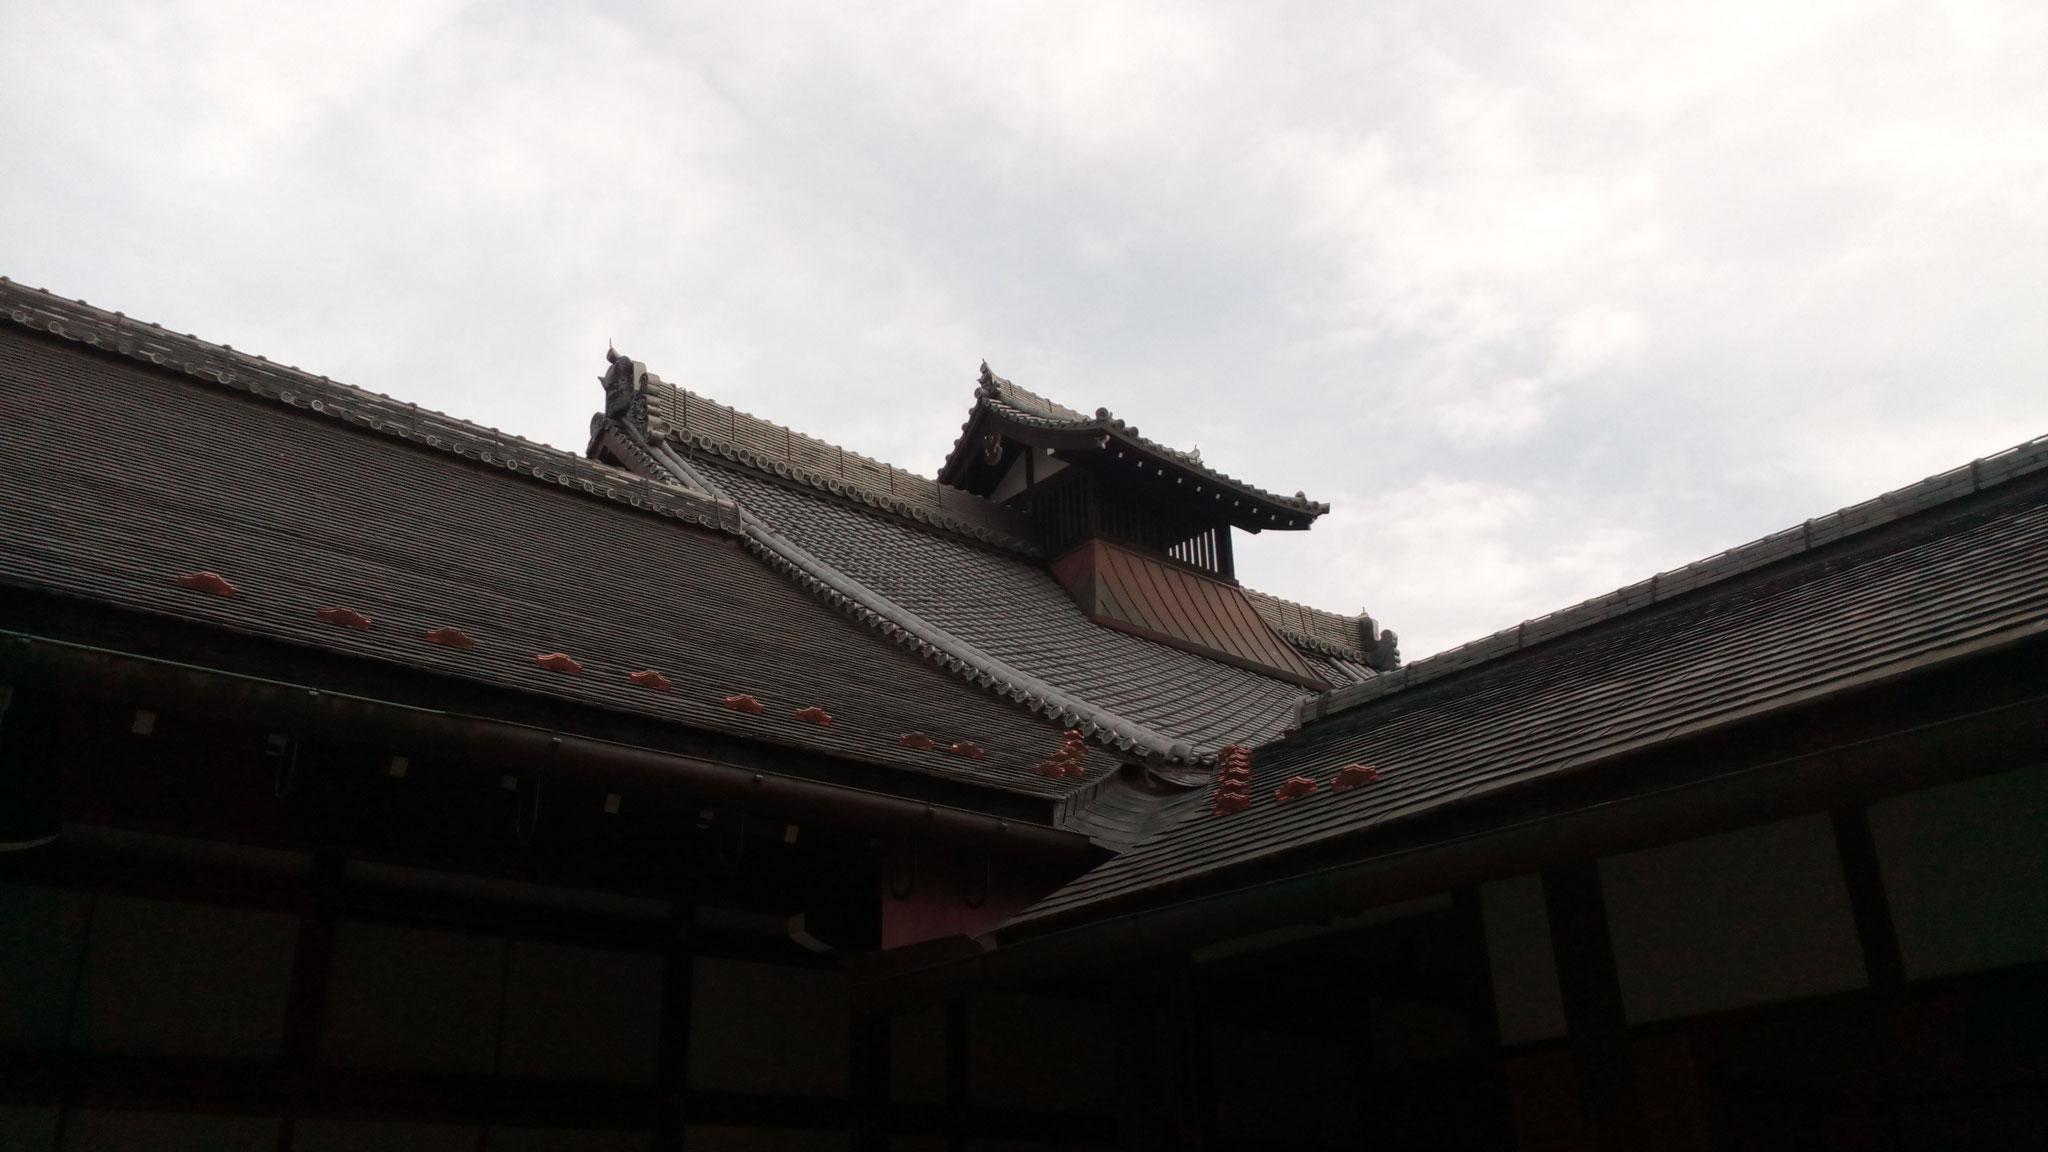 京都五山の第一位